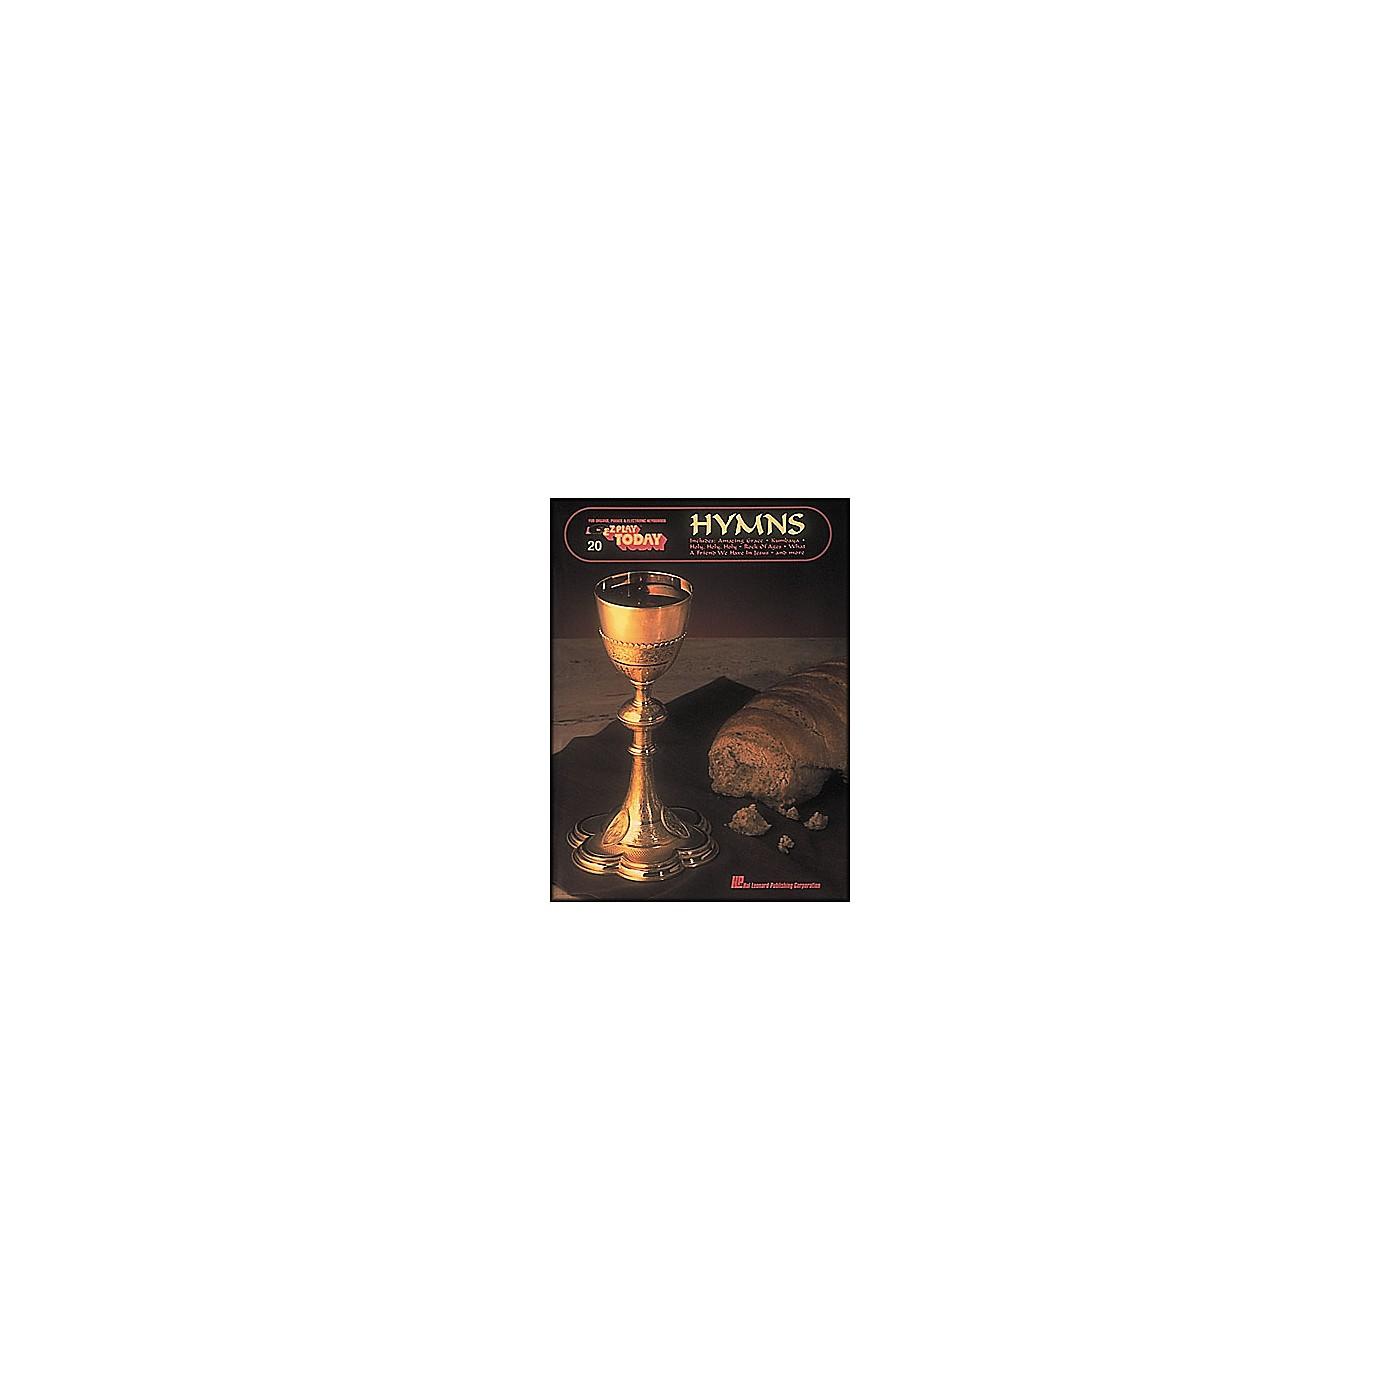 Hal Leonard Hymns E-Z Play 20 thumbnail